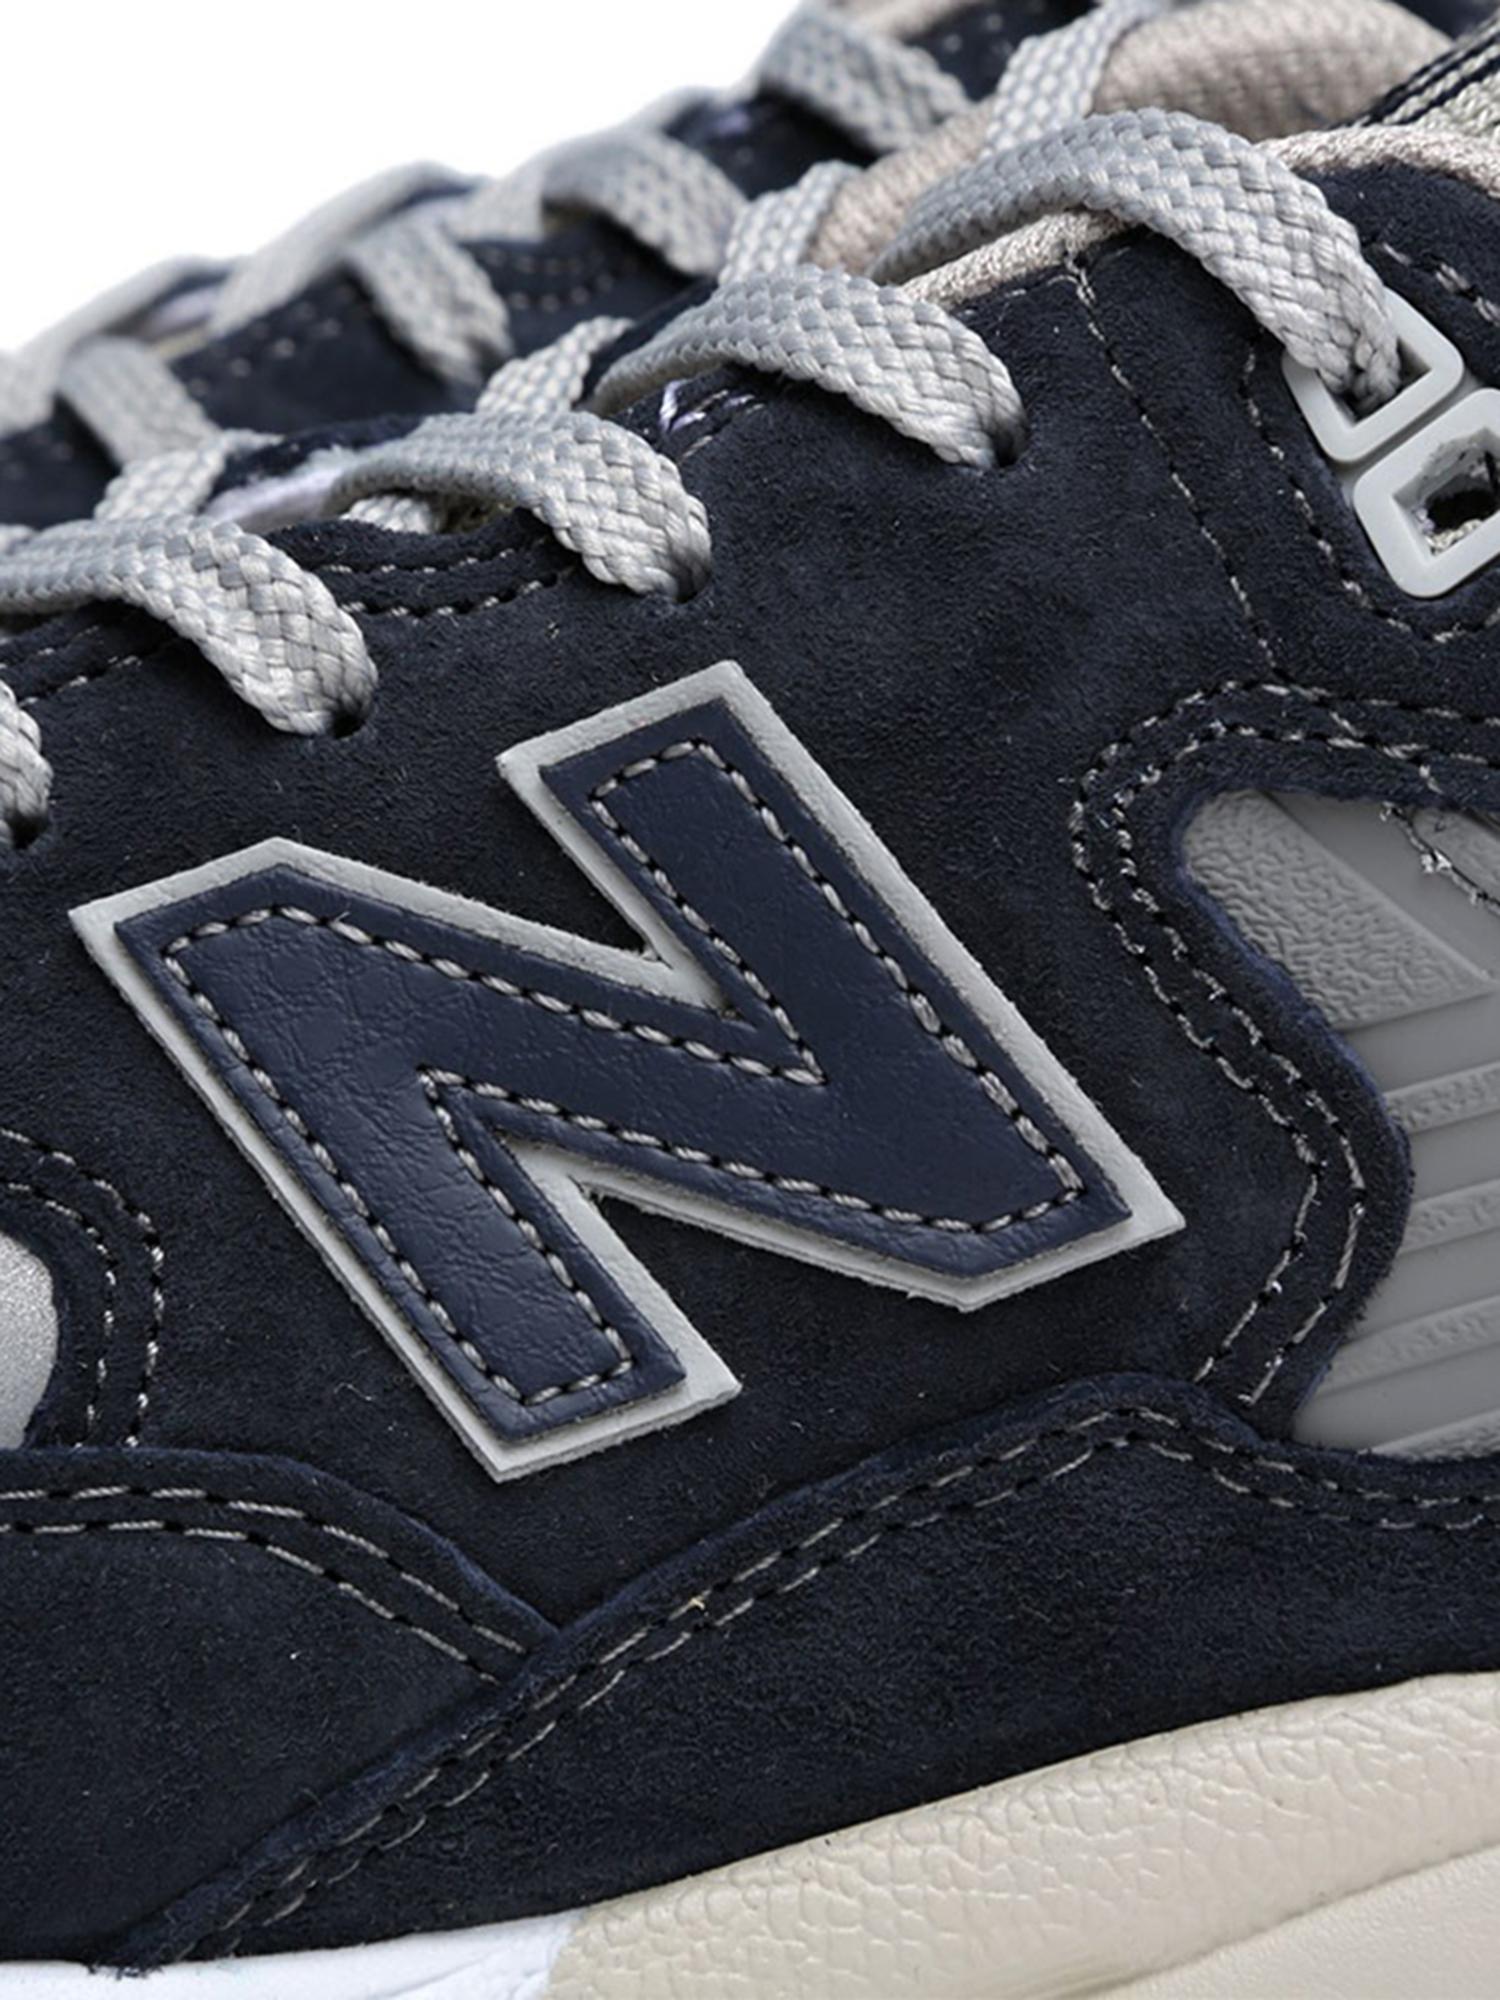 New Balance Men's 580 Elite Edition REVLite Sneakers MRT580NV Navy SZ 5